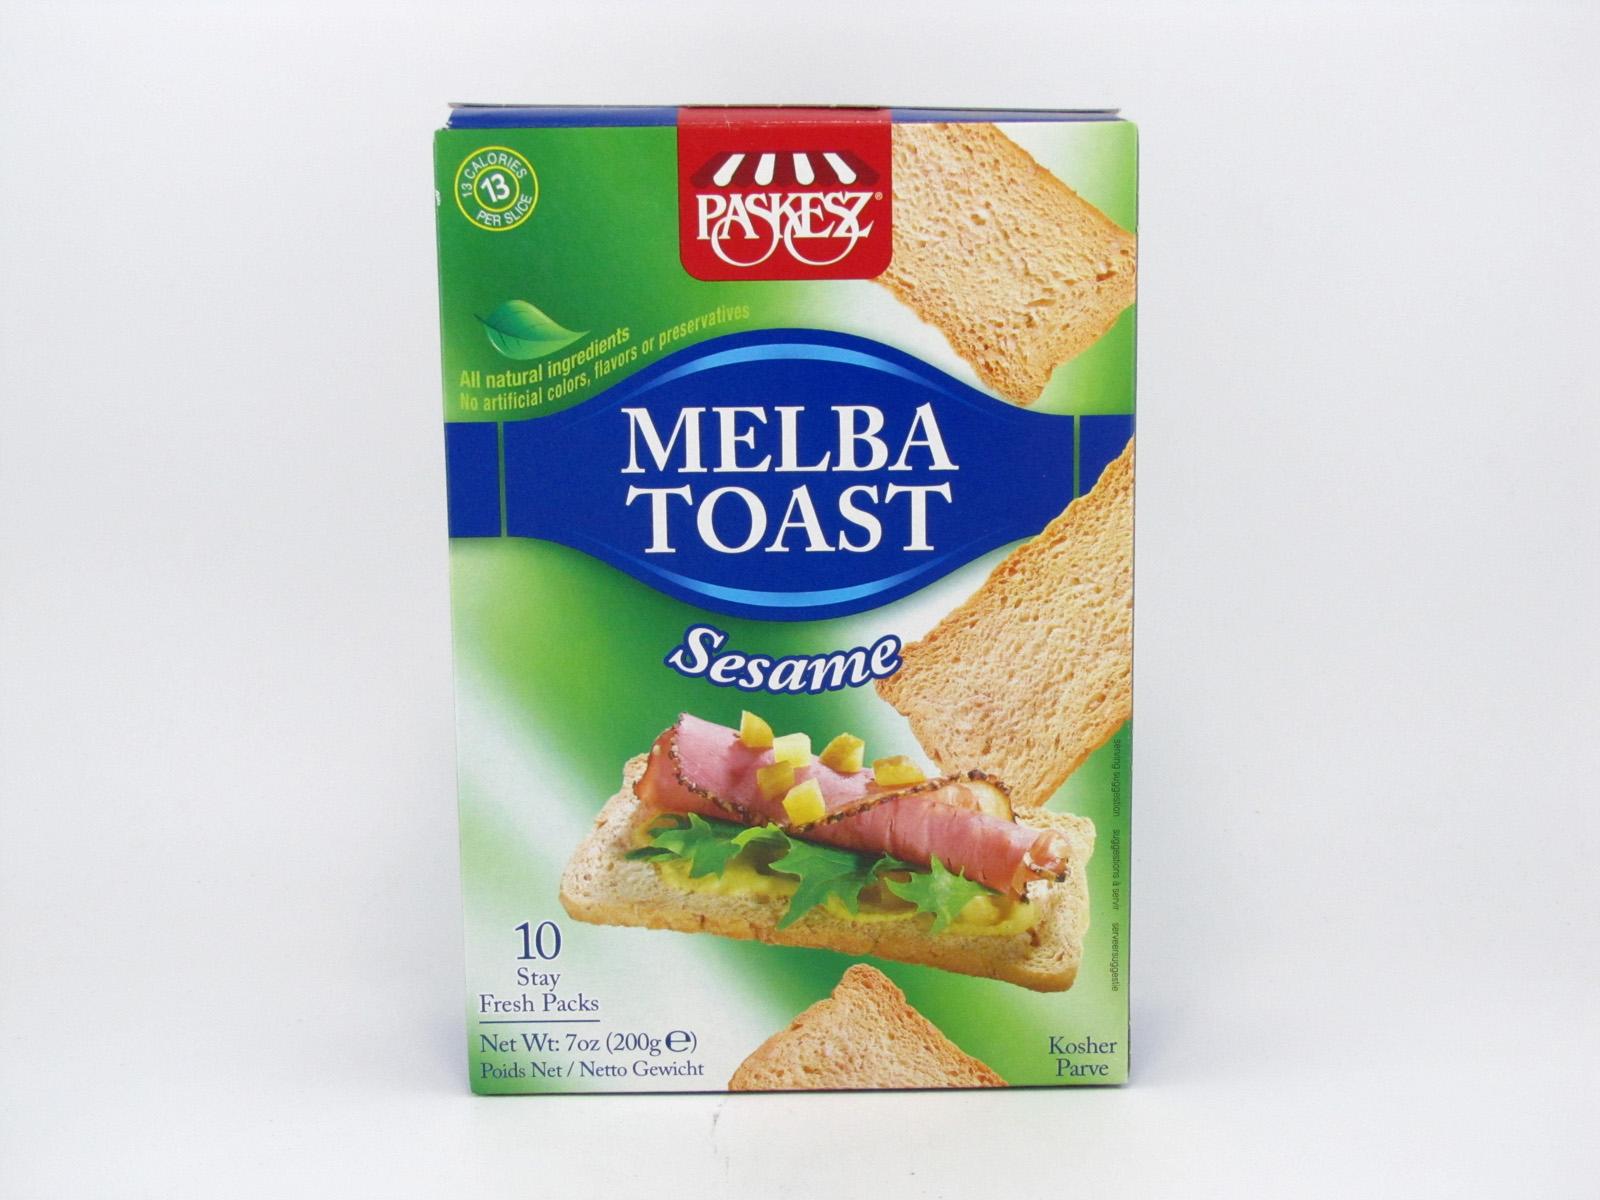 Melba Toast - Sesame - front view